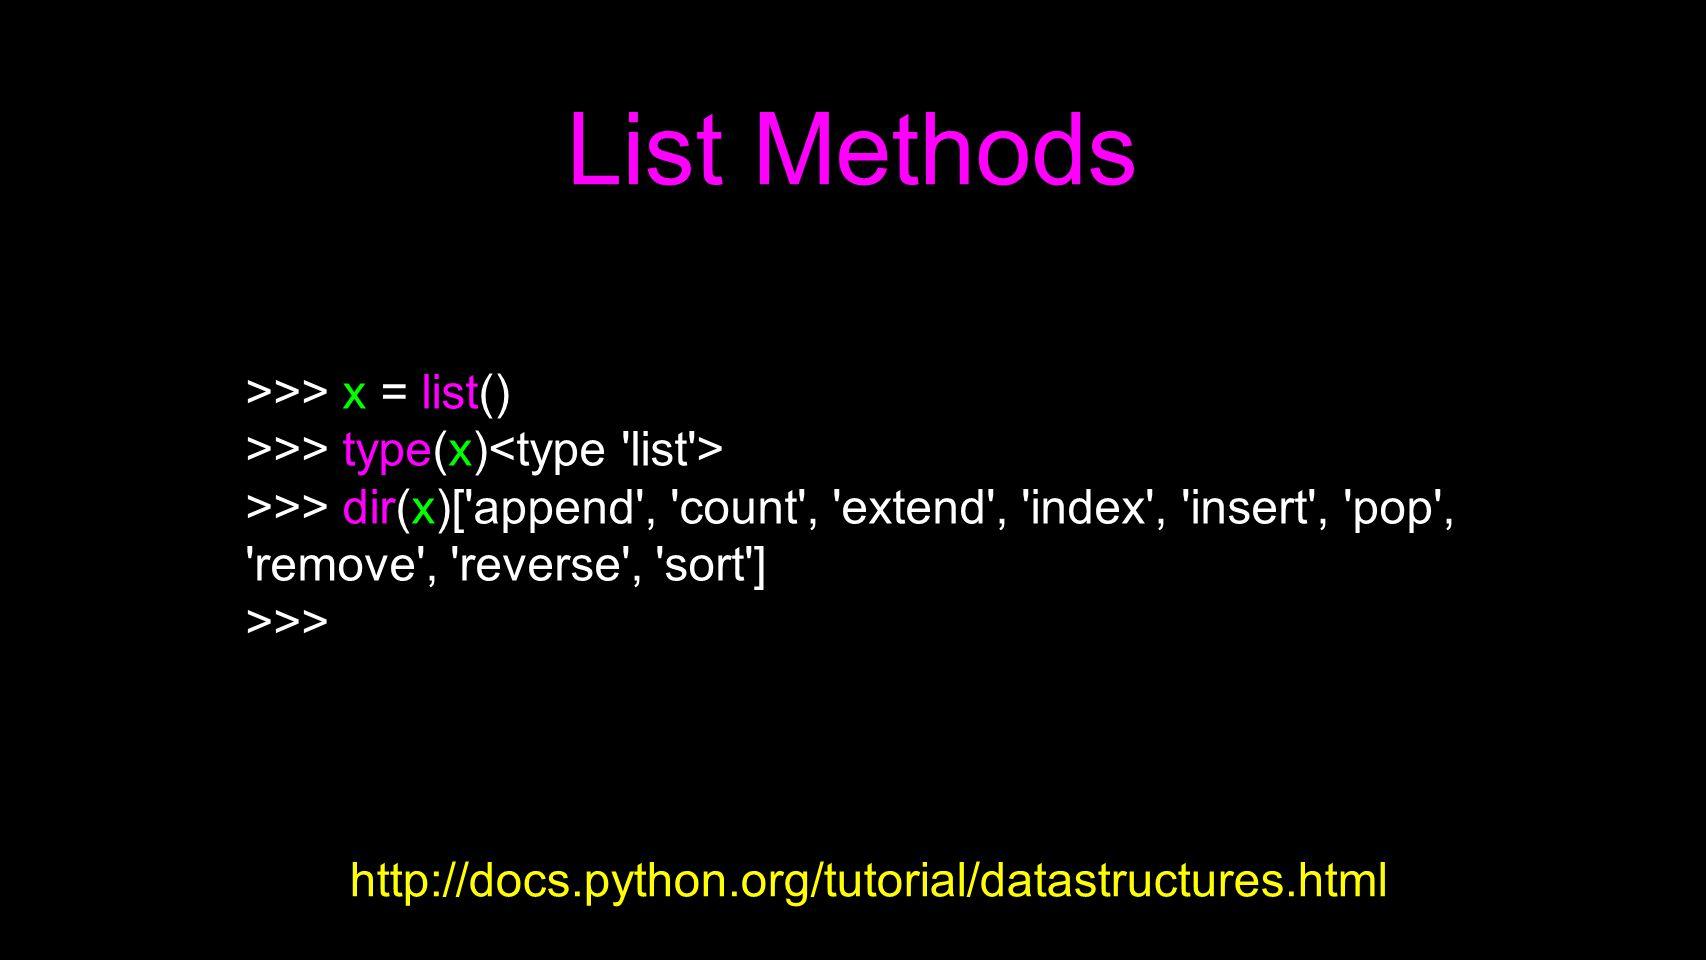 List Methods >>> x = list() >>> type(x) >>> dir(x)['append', 'count', 'extend', 'index', 'insert', 'pop', 'remove', 'reverse', 'sort'] >>> http://docs